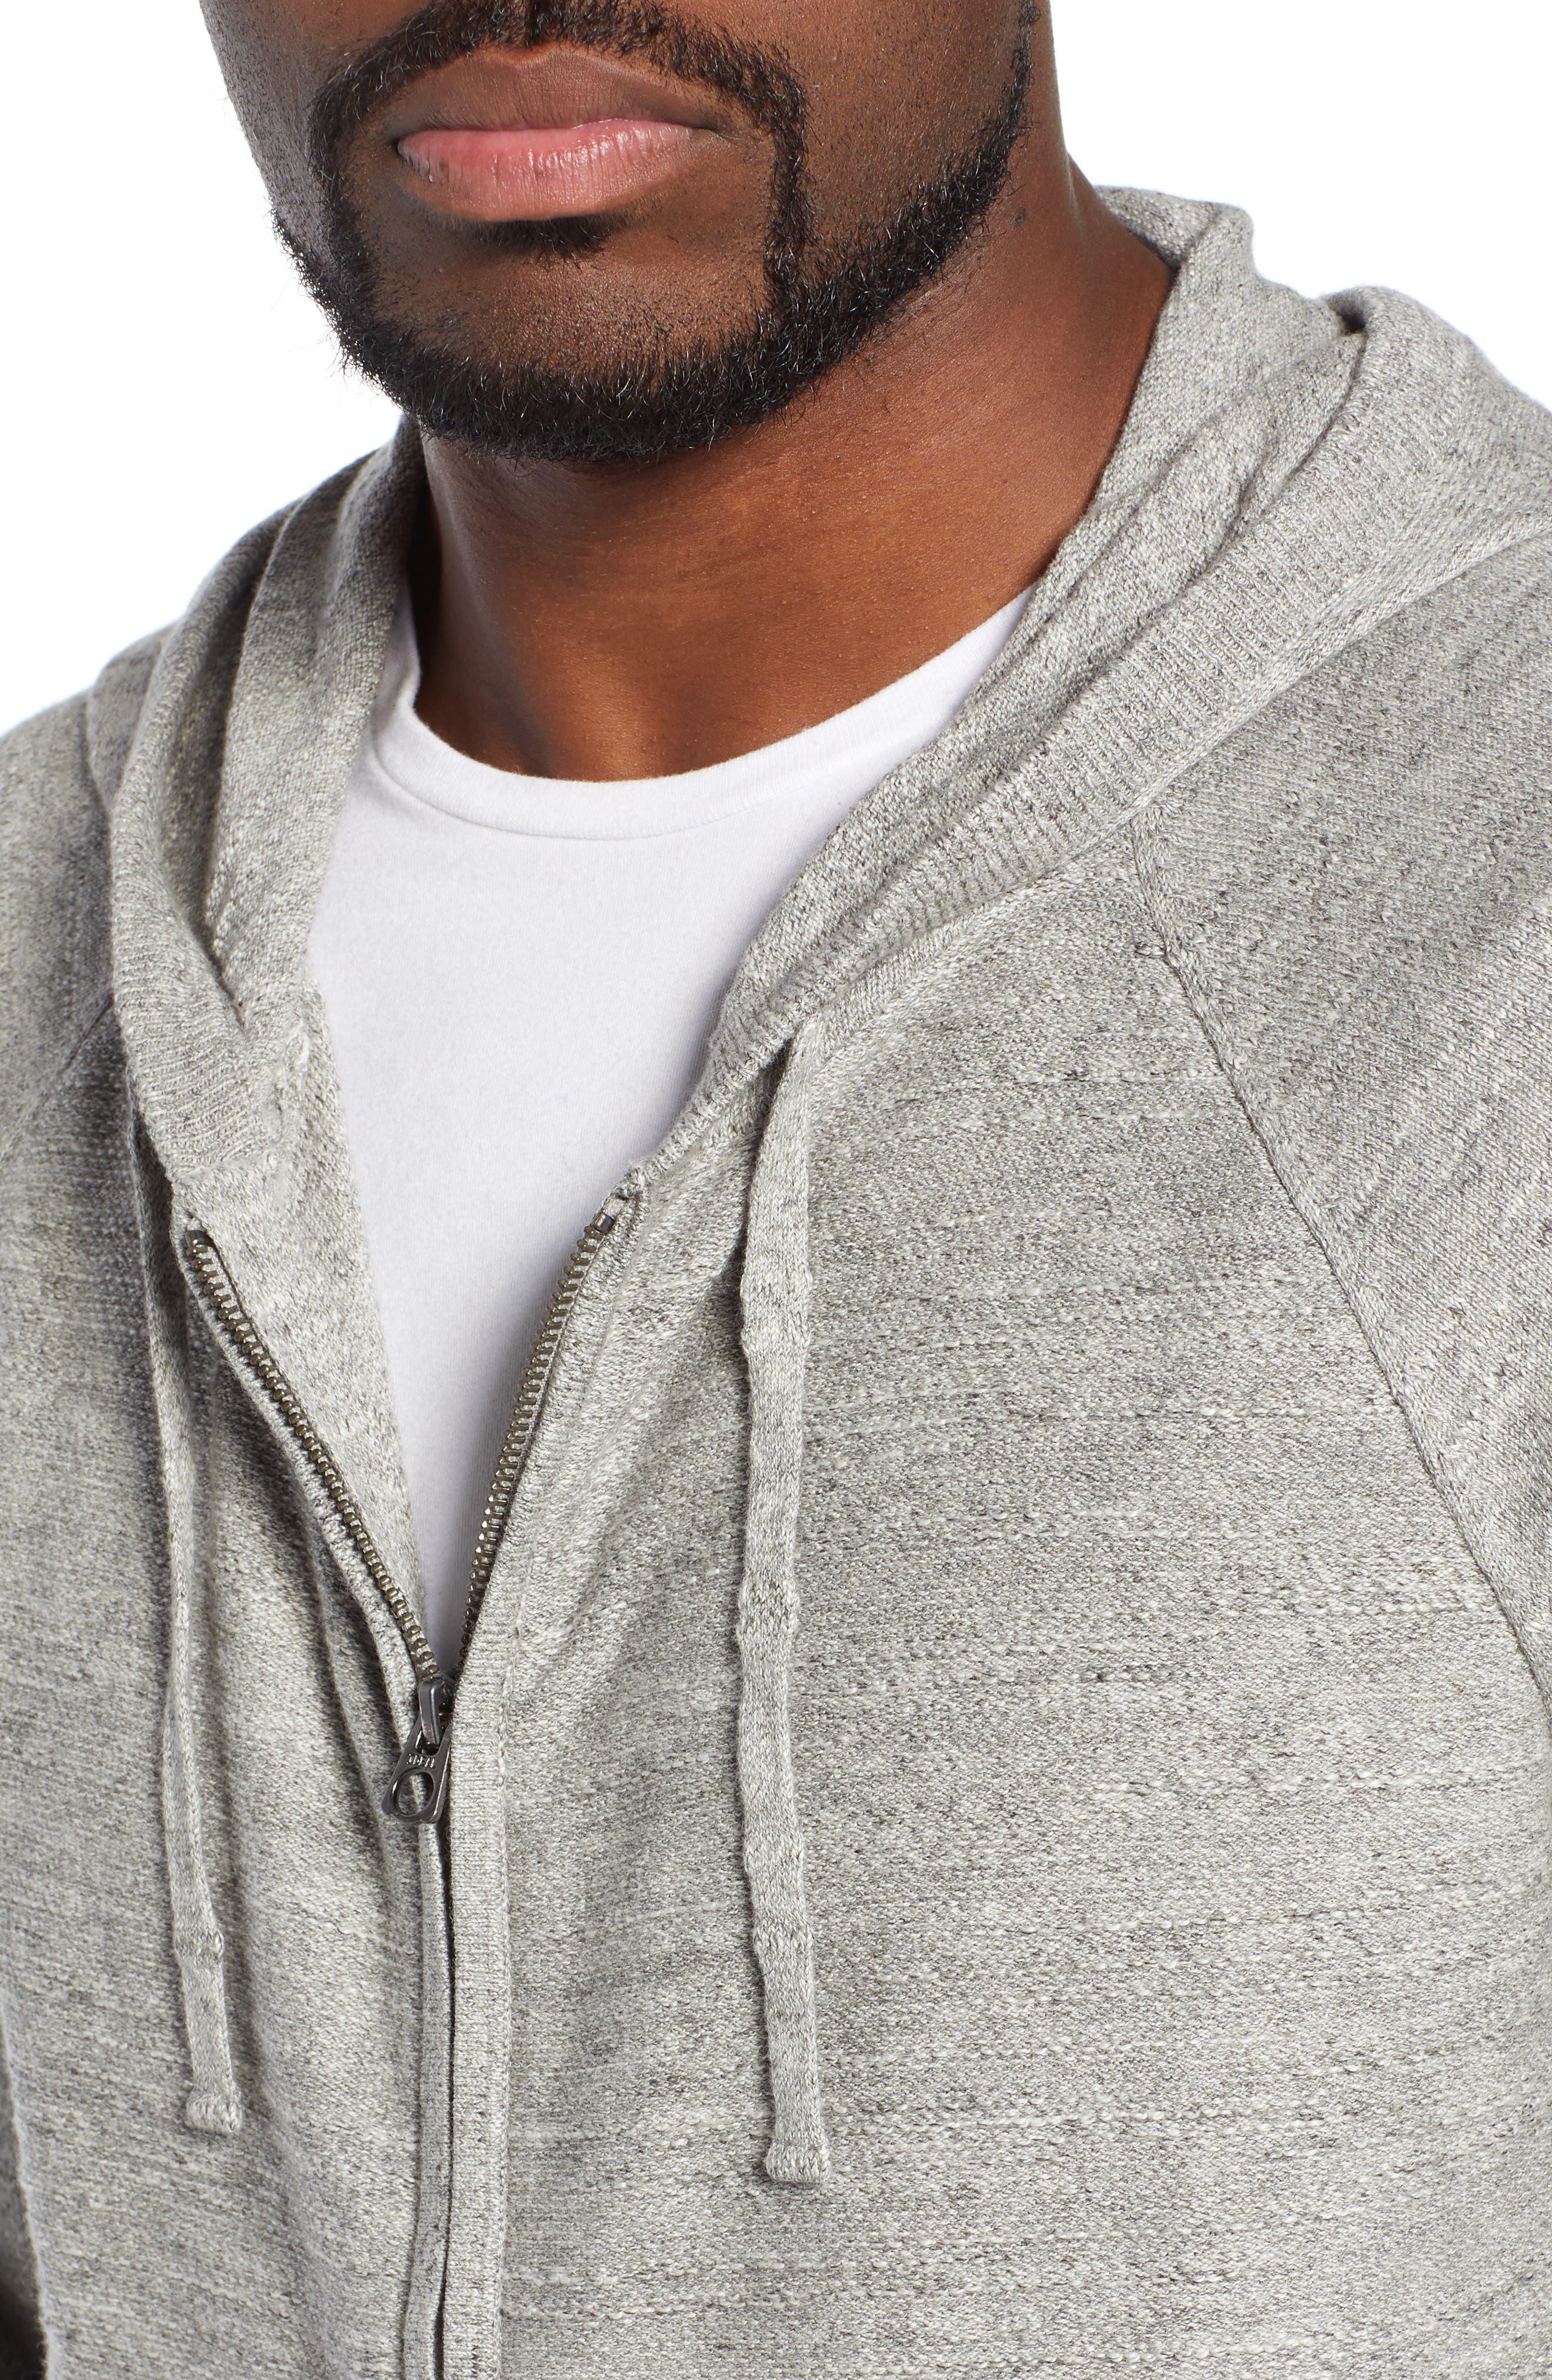 Rugged Raglan Sleeve Cotton Hoodie,                             Alternate thumbnail 4, color,                             020